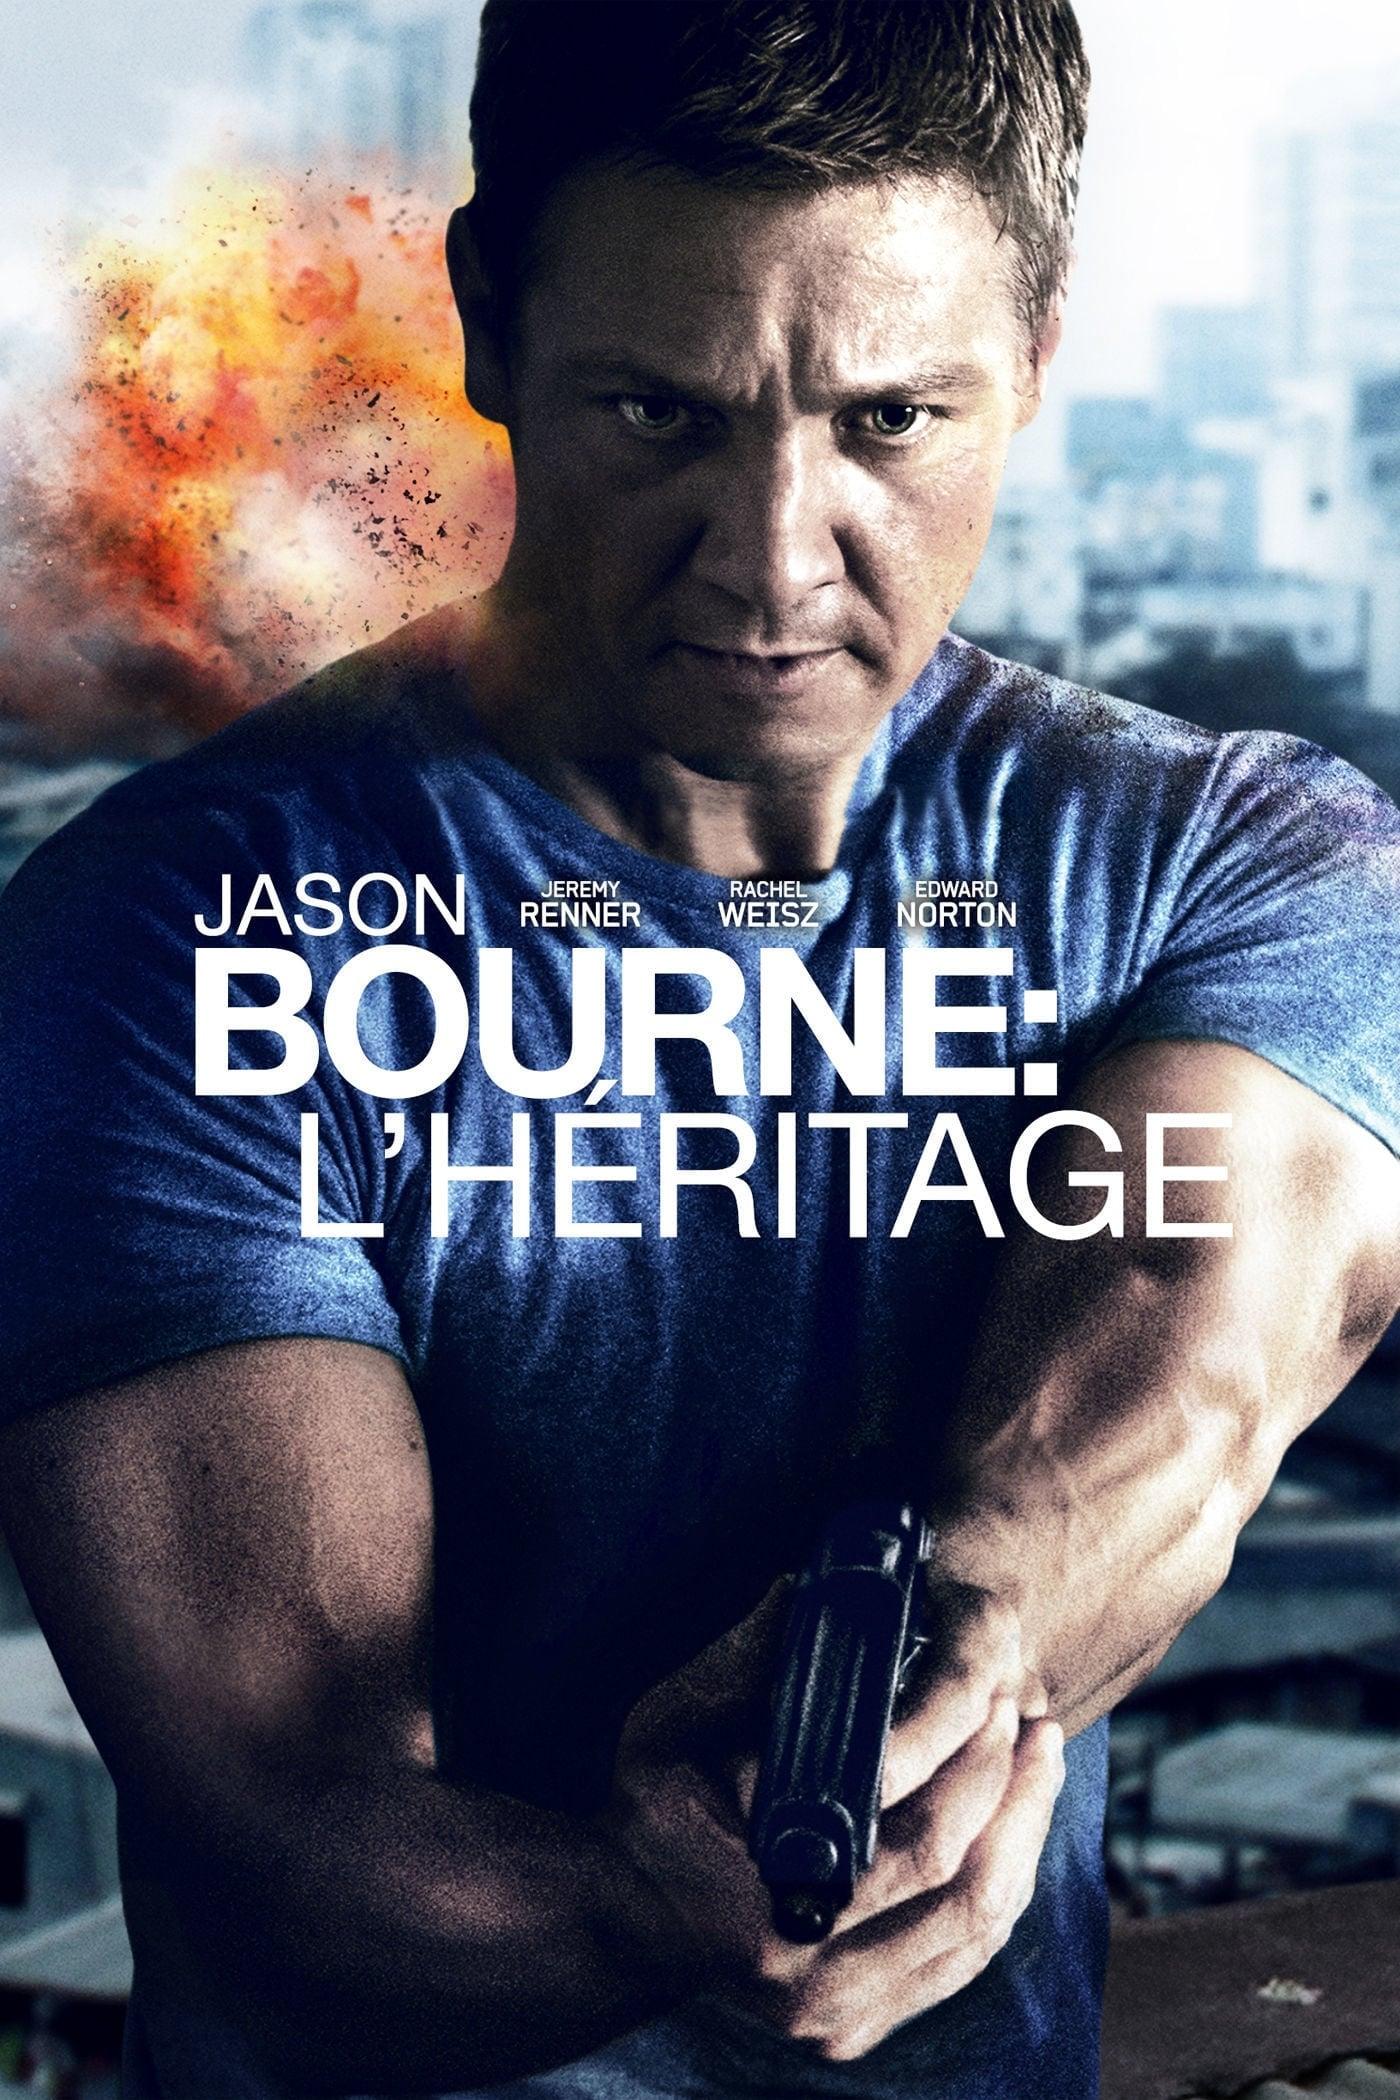 Regarder Jason Bourne : L'Héritage en streaming gratuit